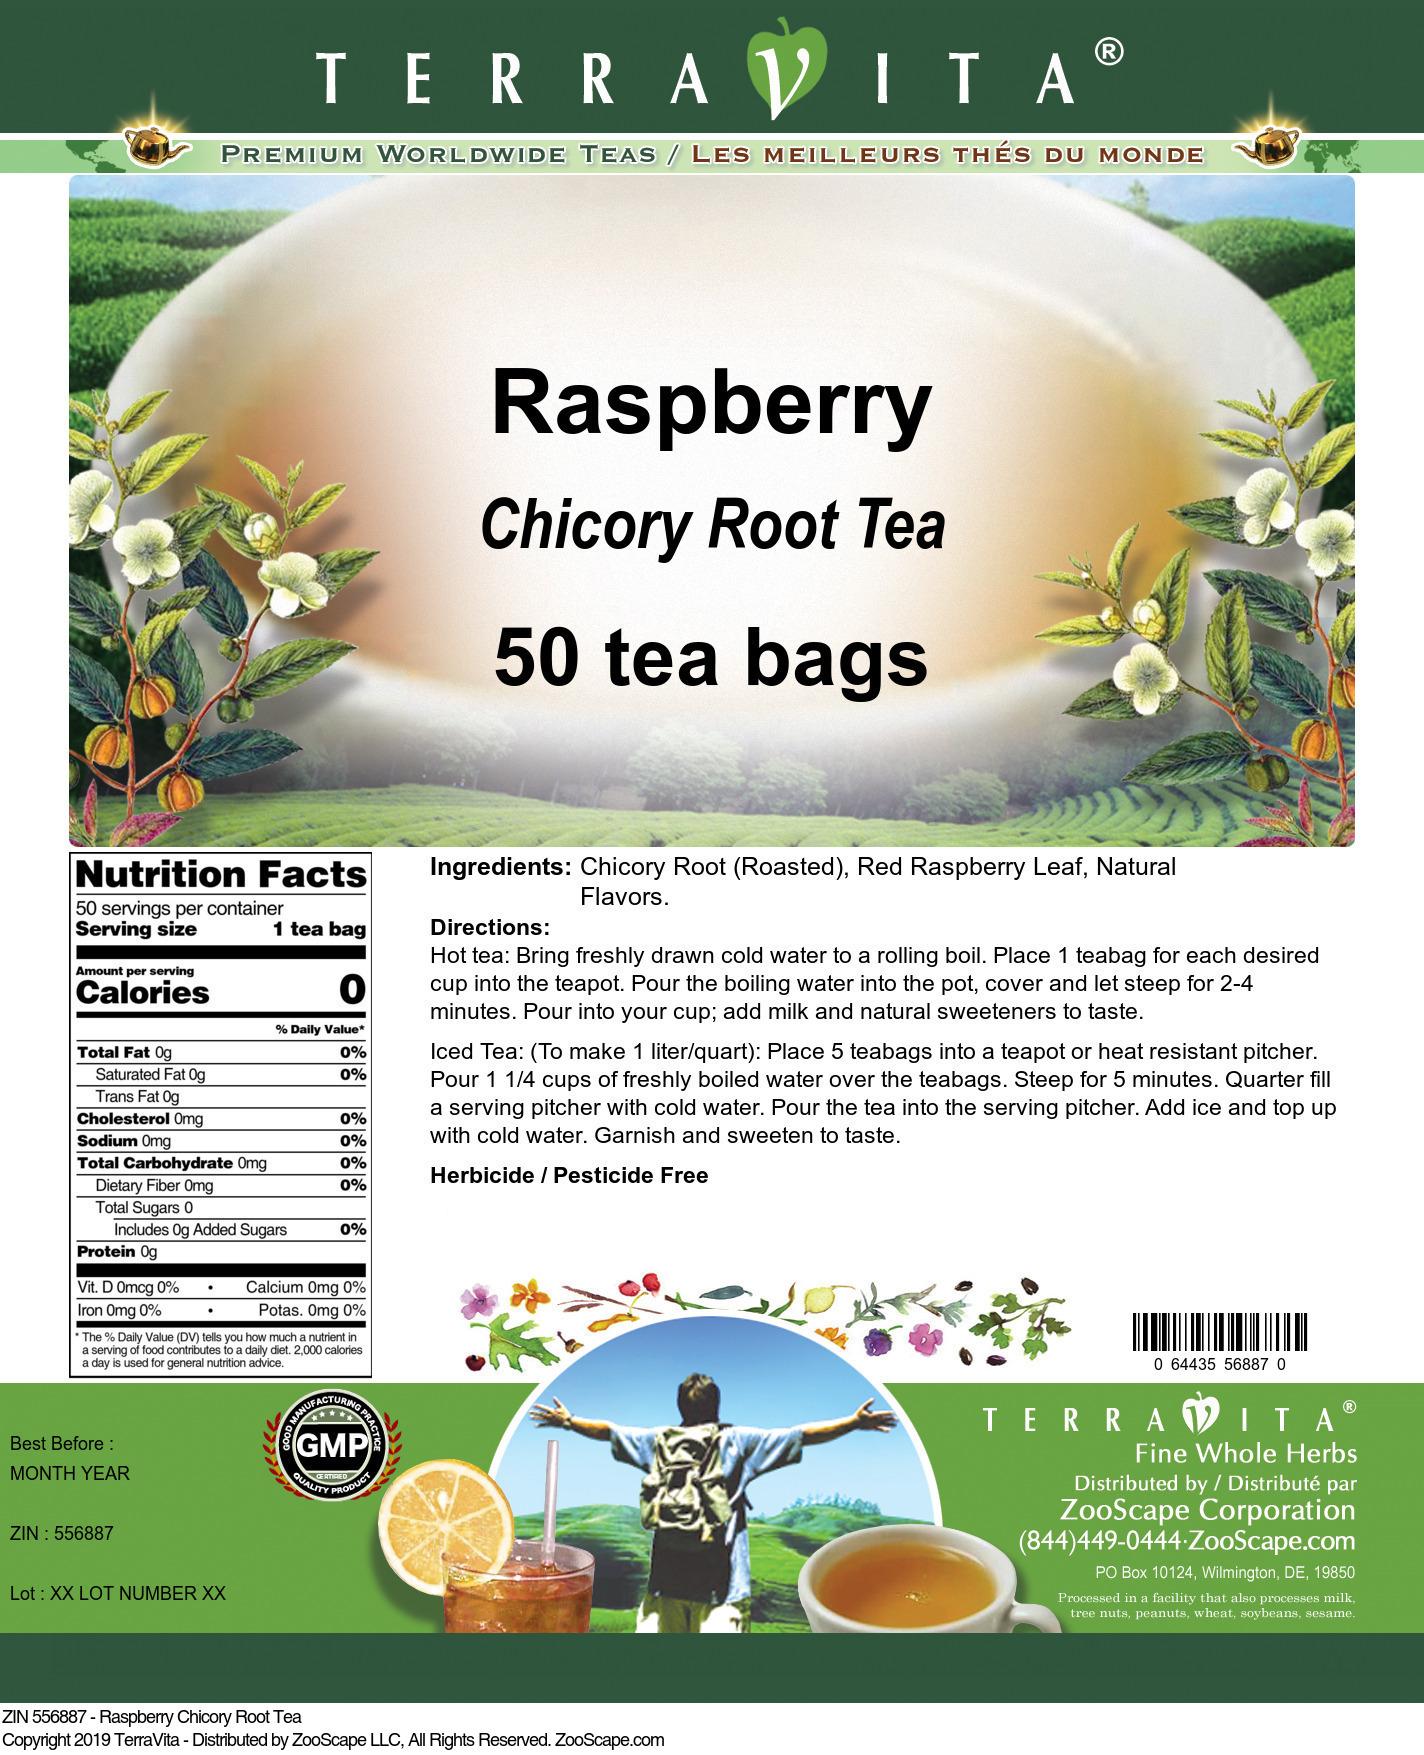 Raspberry Chicory Root Tea